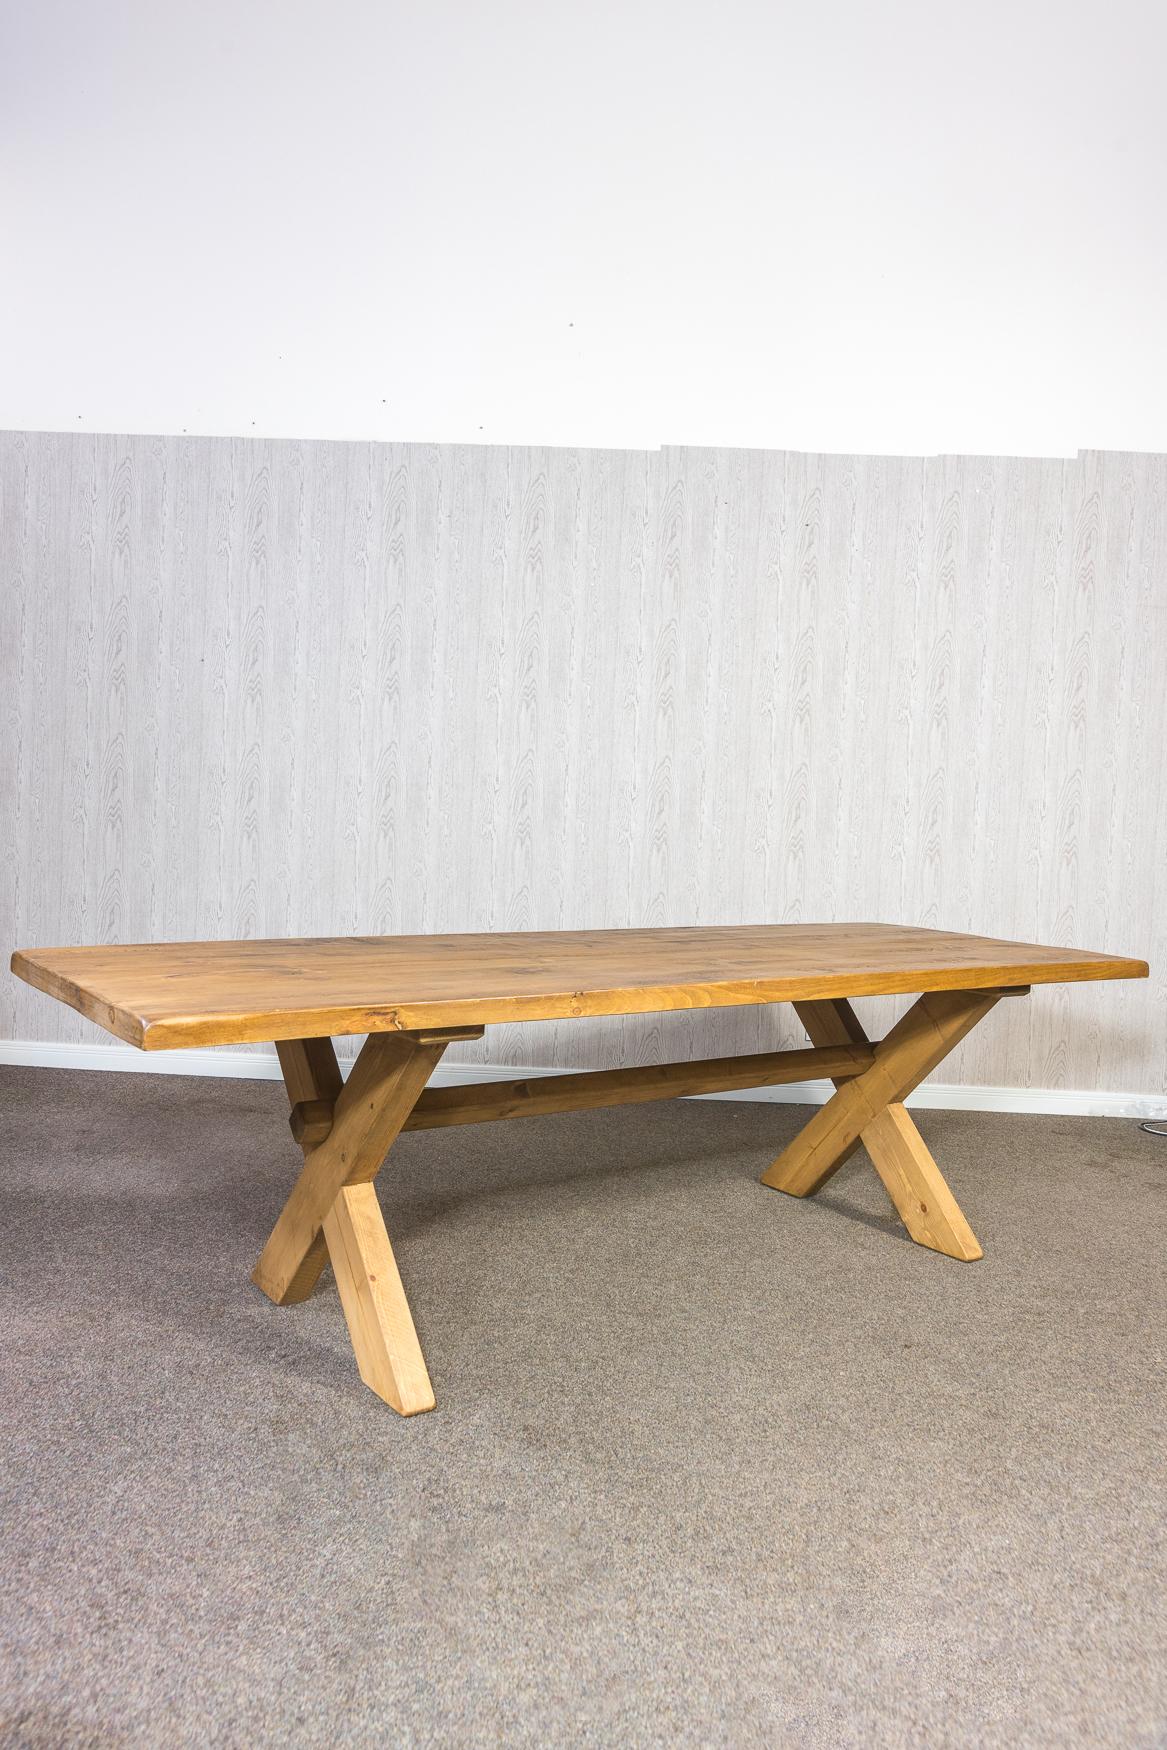 RUSTIC 1800mm X Leg Dining Table